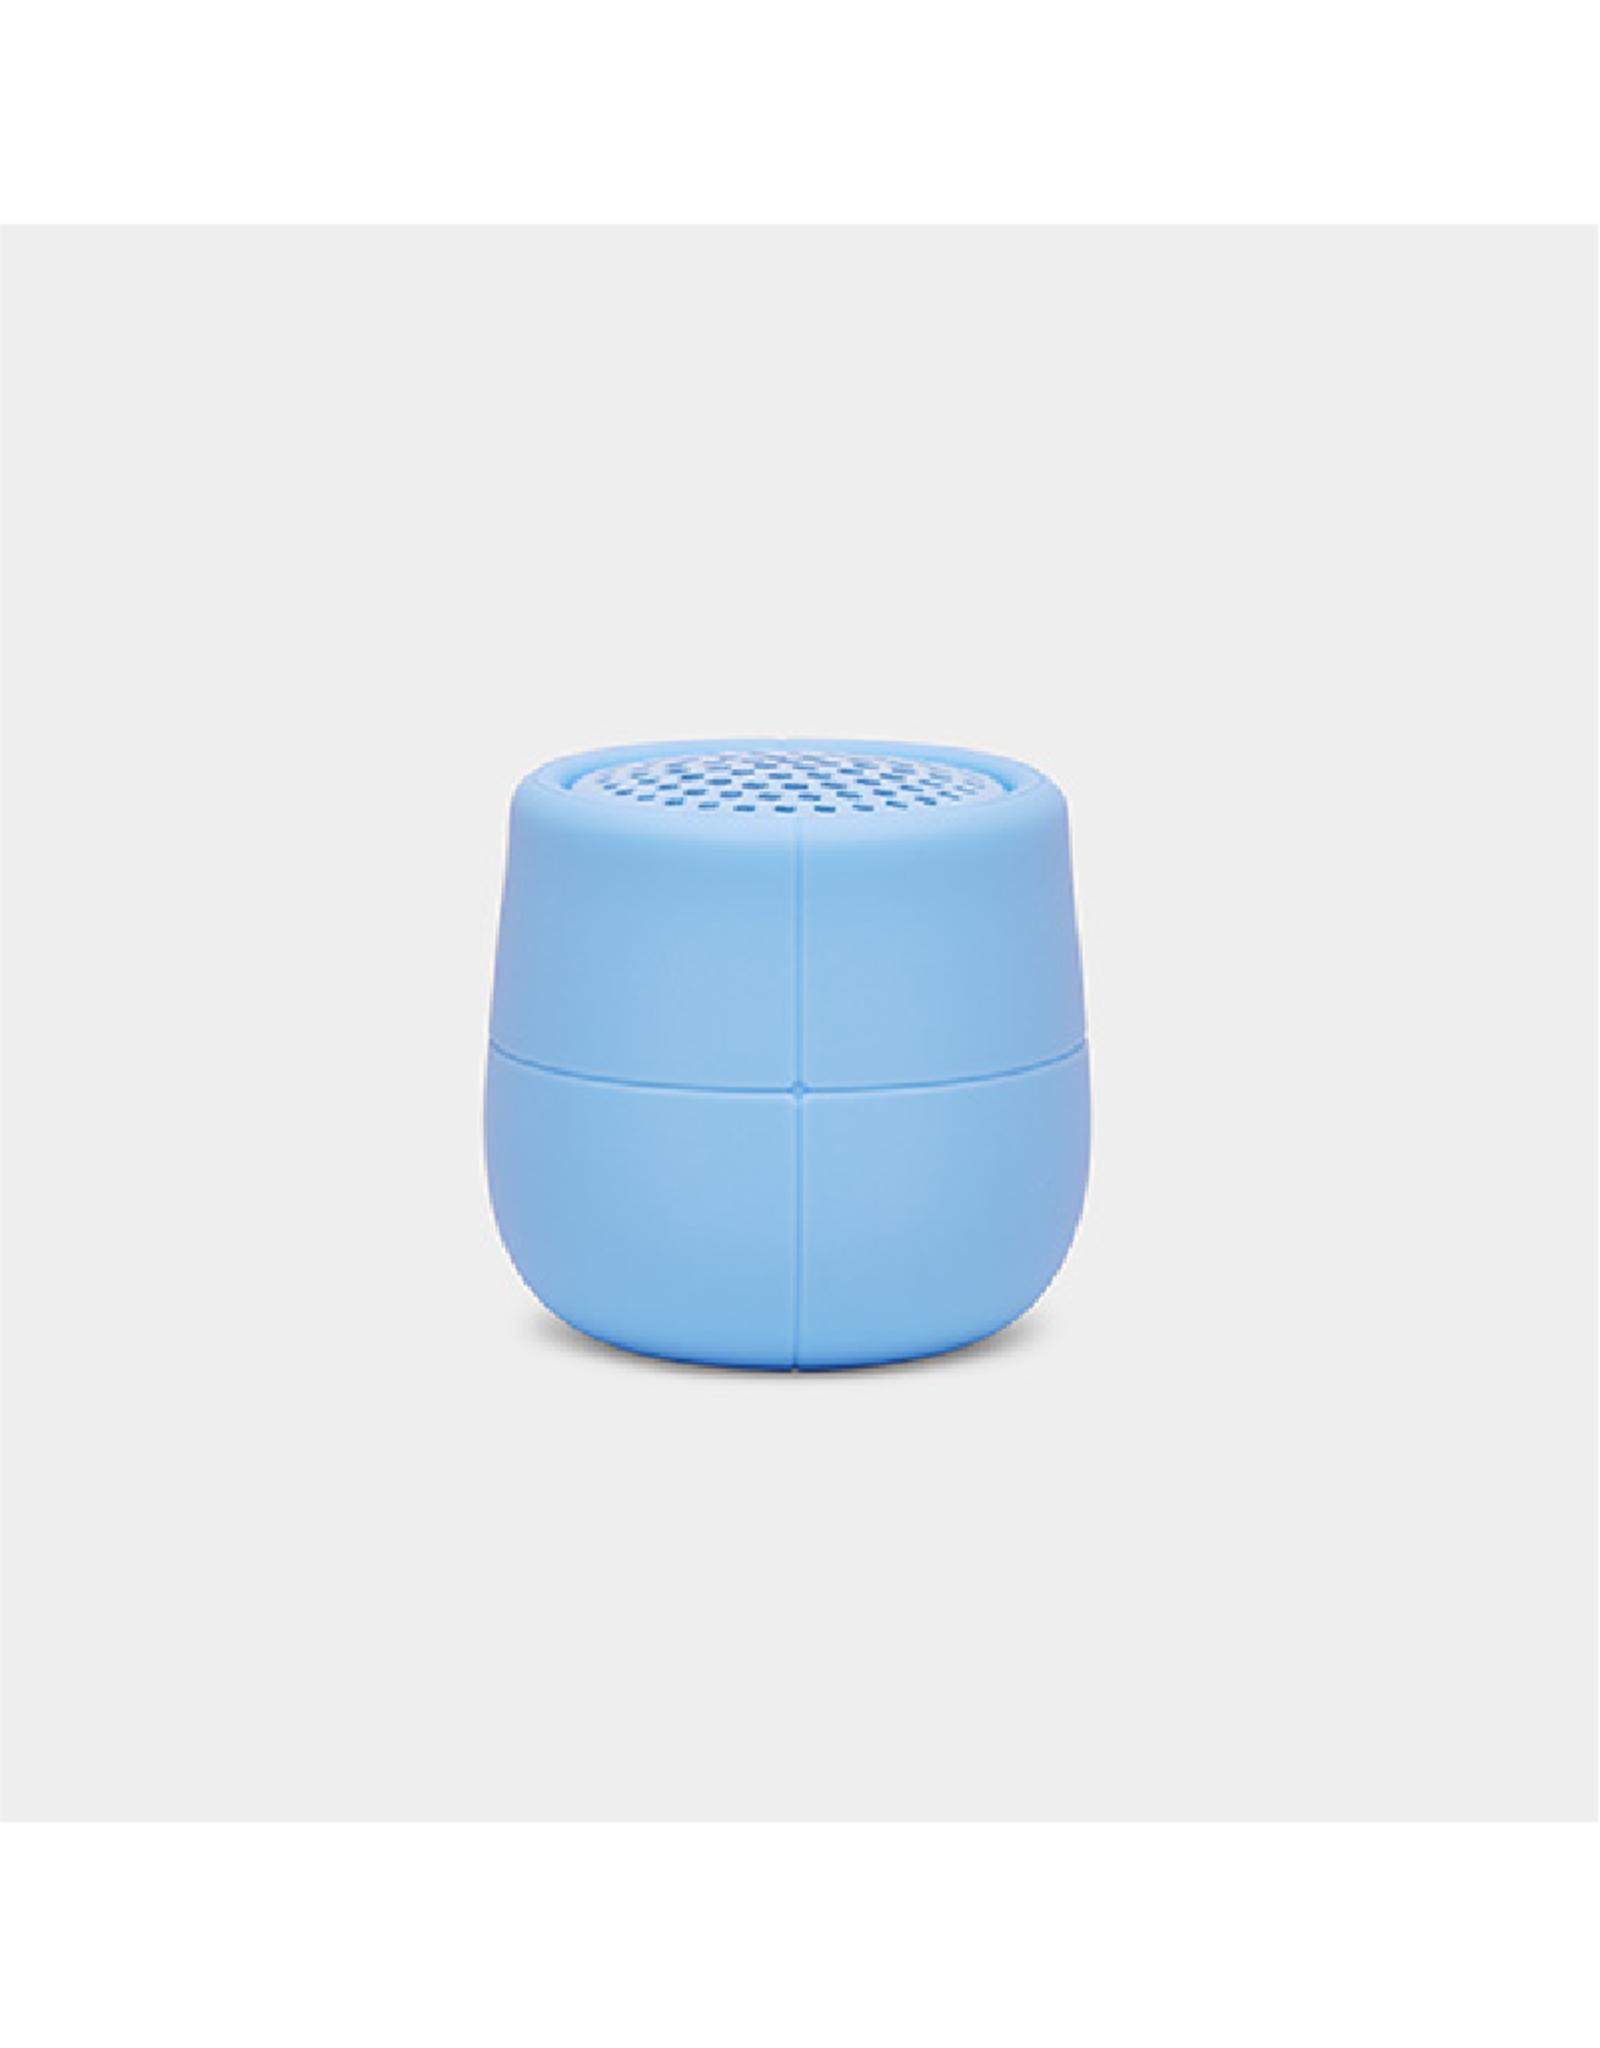 Lexon Lexon Mino X Waterproof Bluetooth Speaker